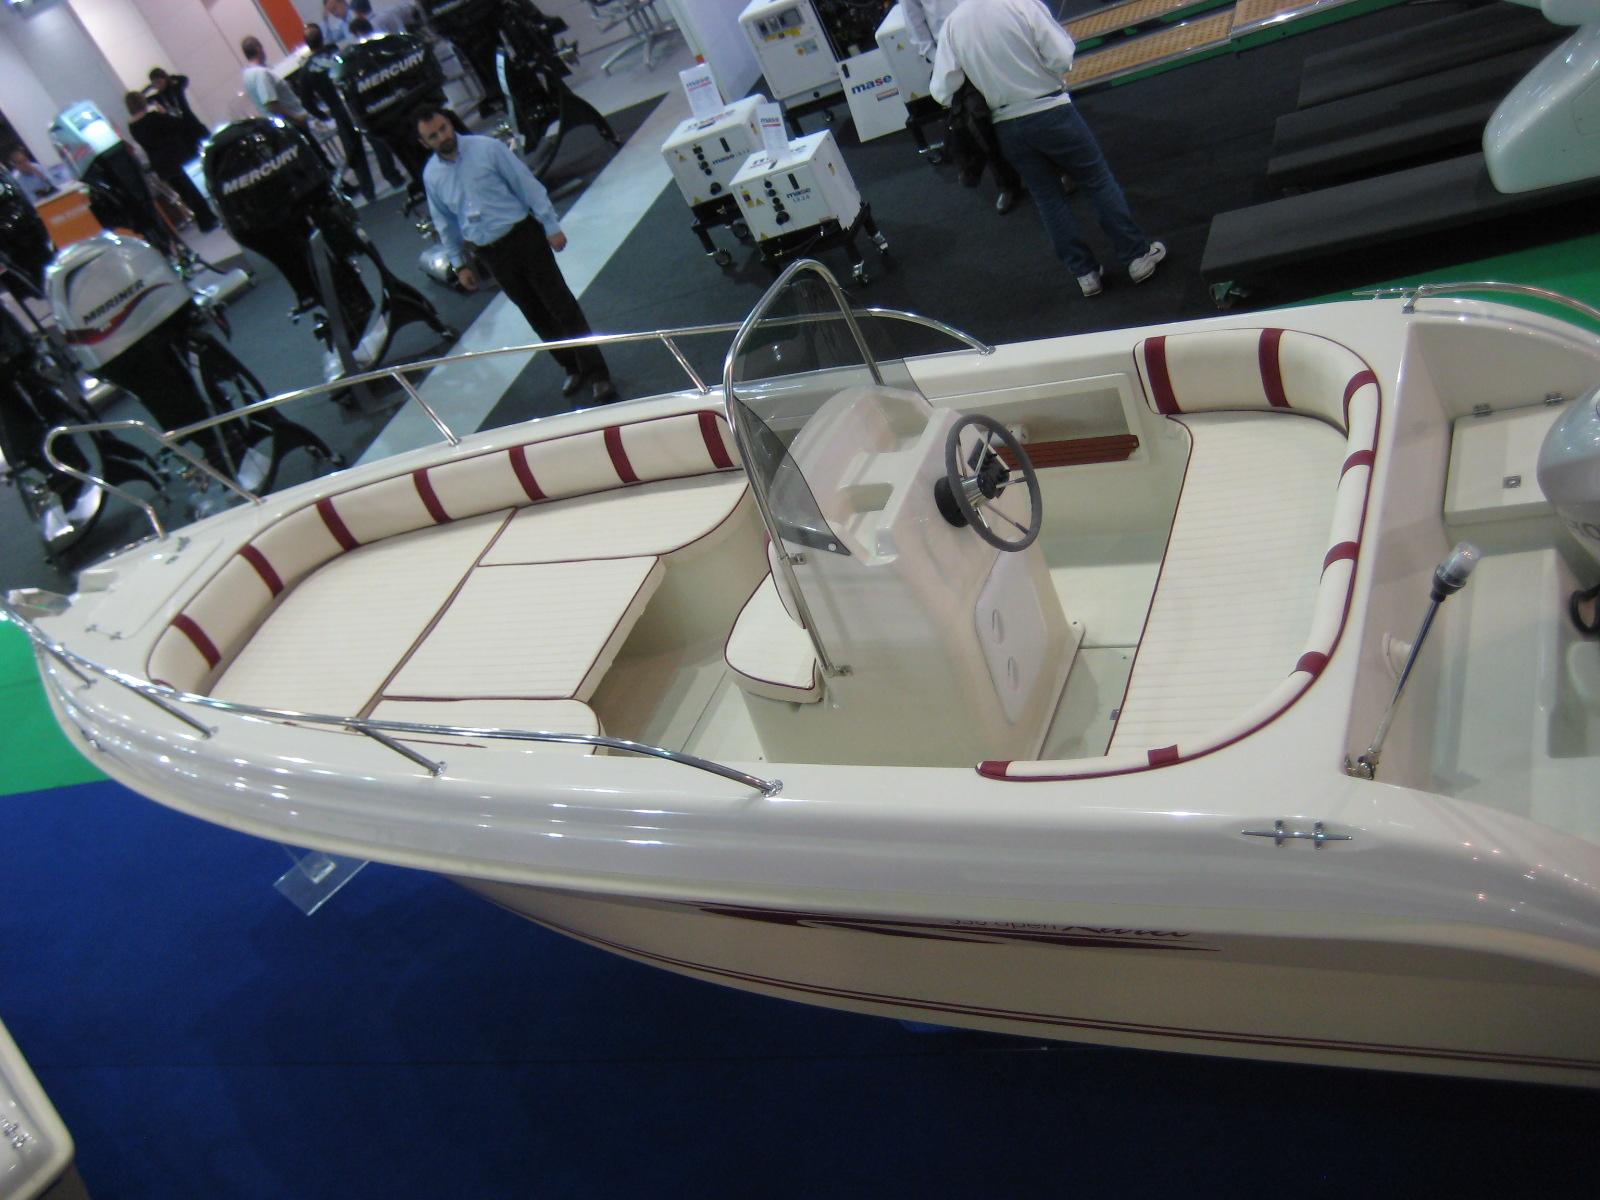 Konsolenboot 5,30m